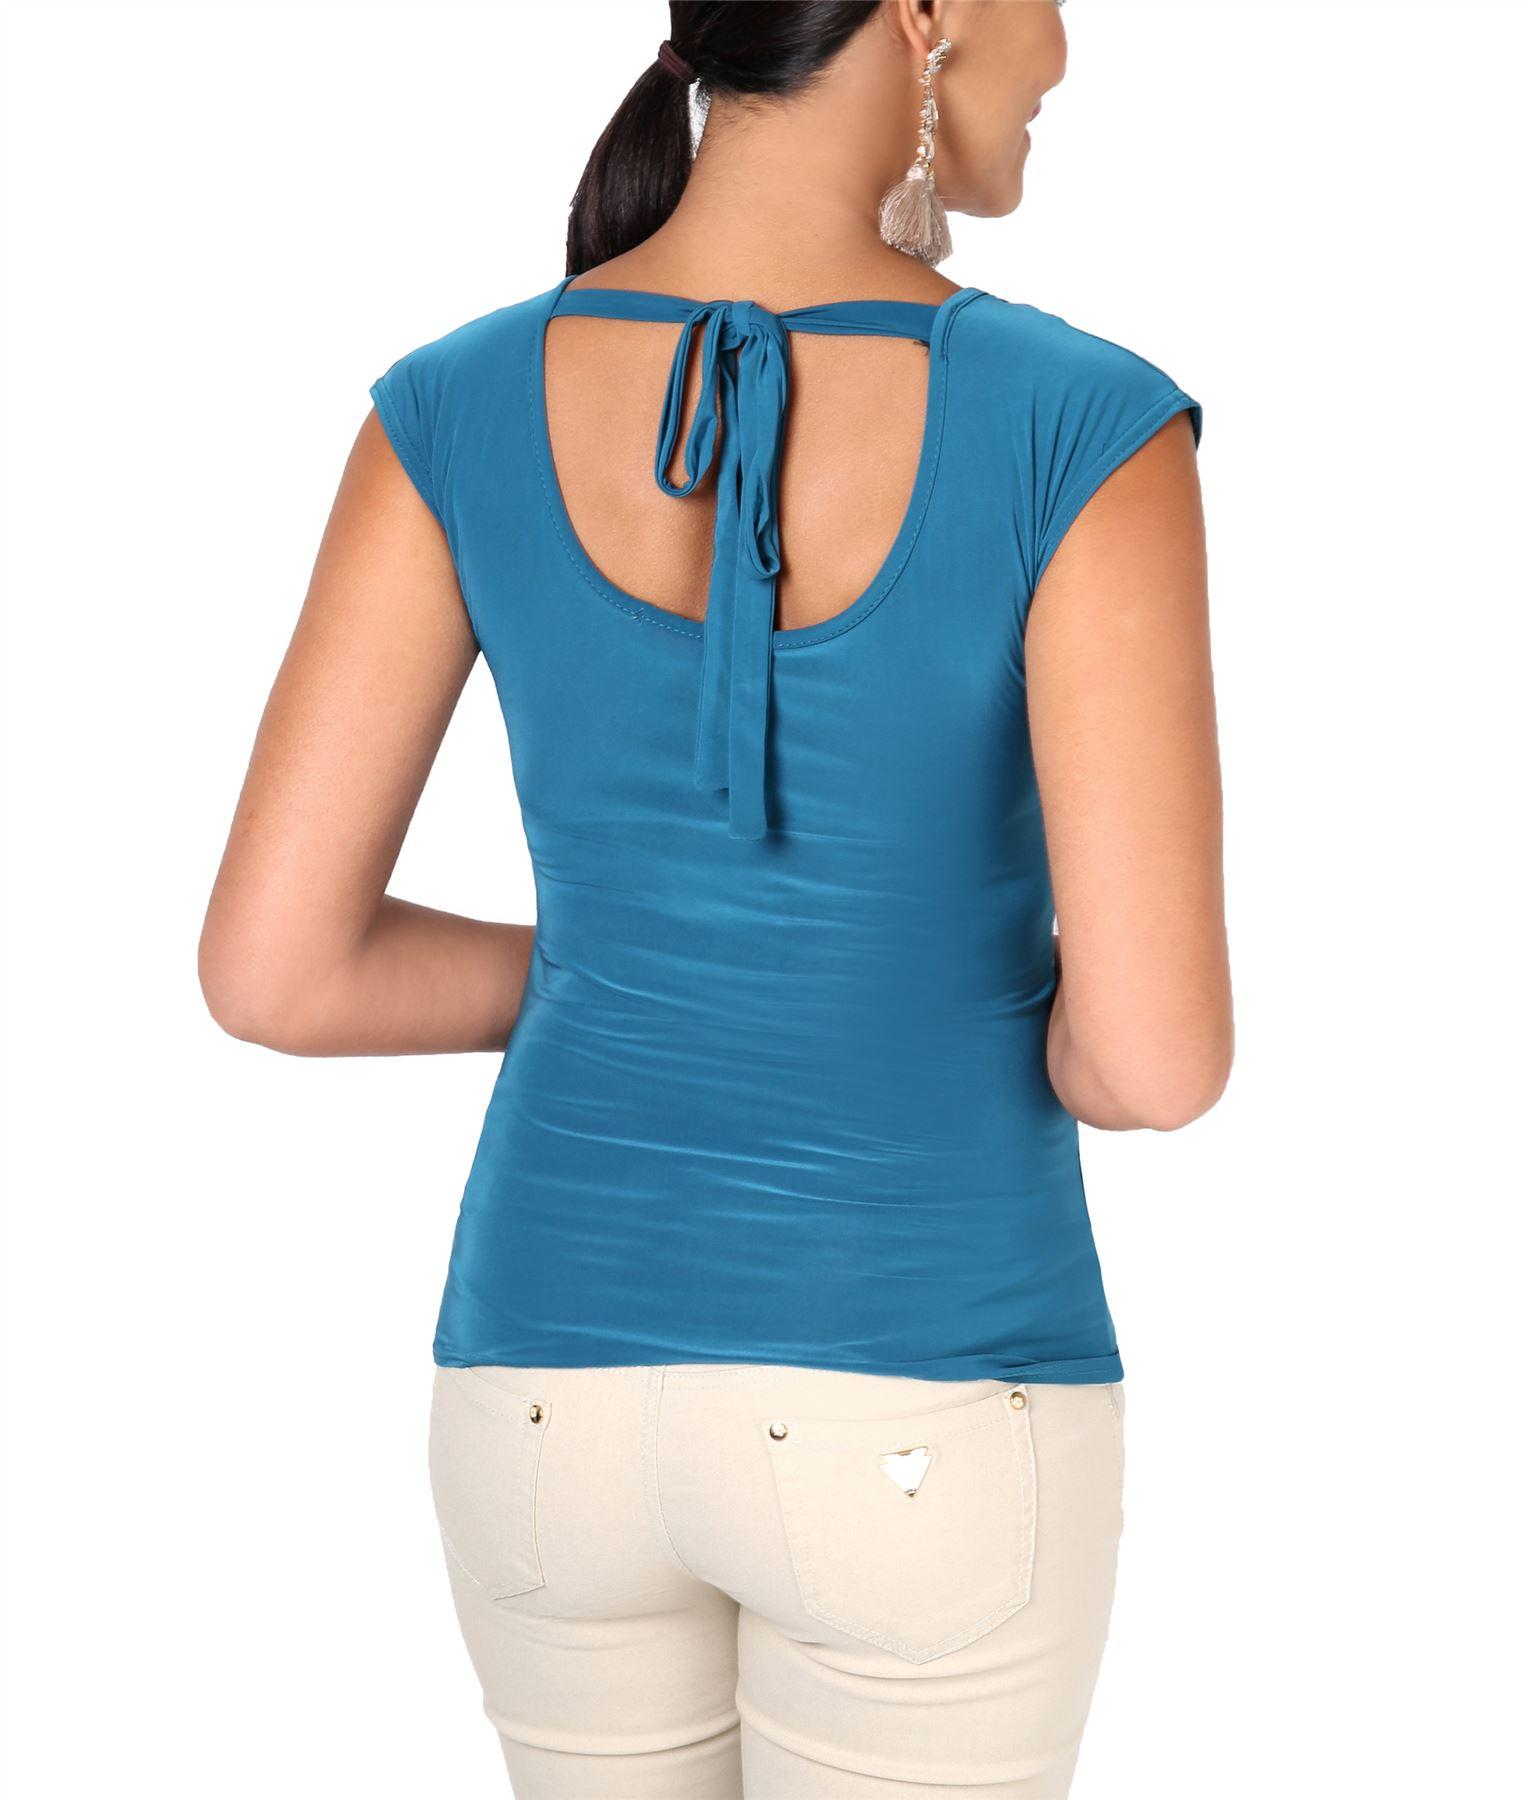 Womens-Ladies-Cowl-Neck-Top-Sleeveless-Silk-Drape-T-Shirt-Low-Cut-Back-Party thumbnail 20